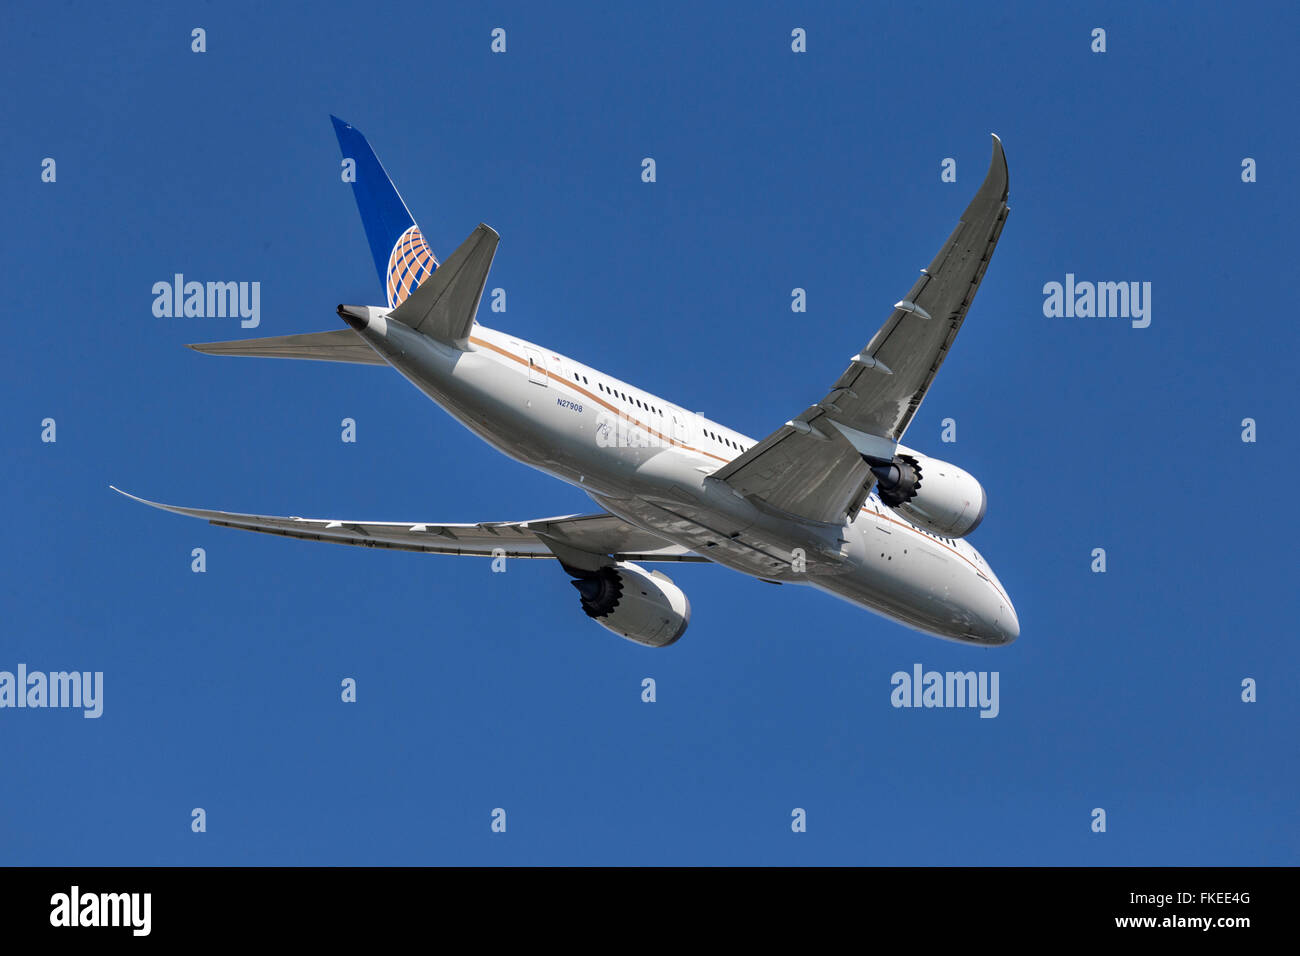 Boeing 787 Dreamliner of United Airlines - Stock Image